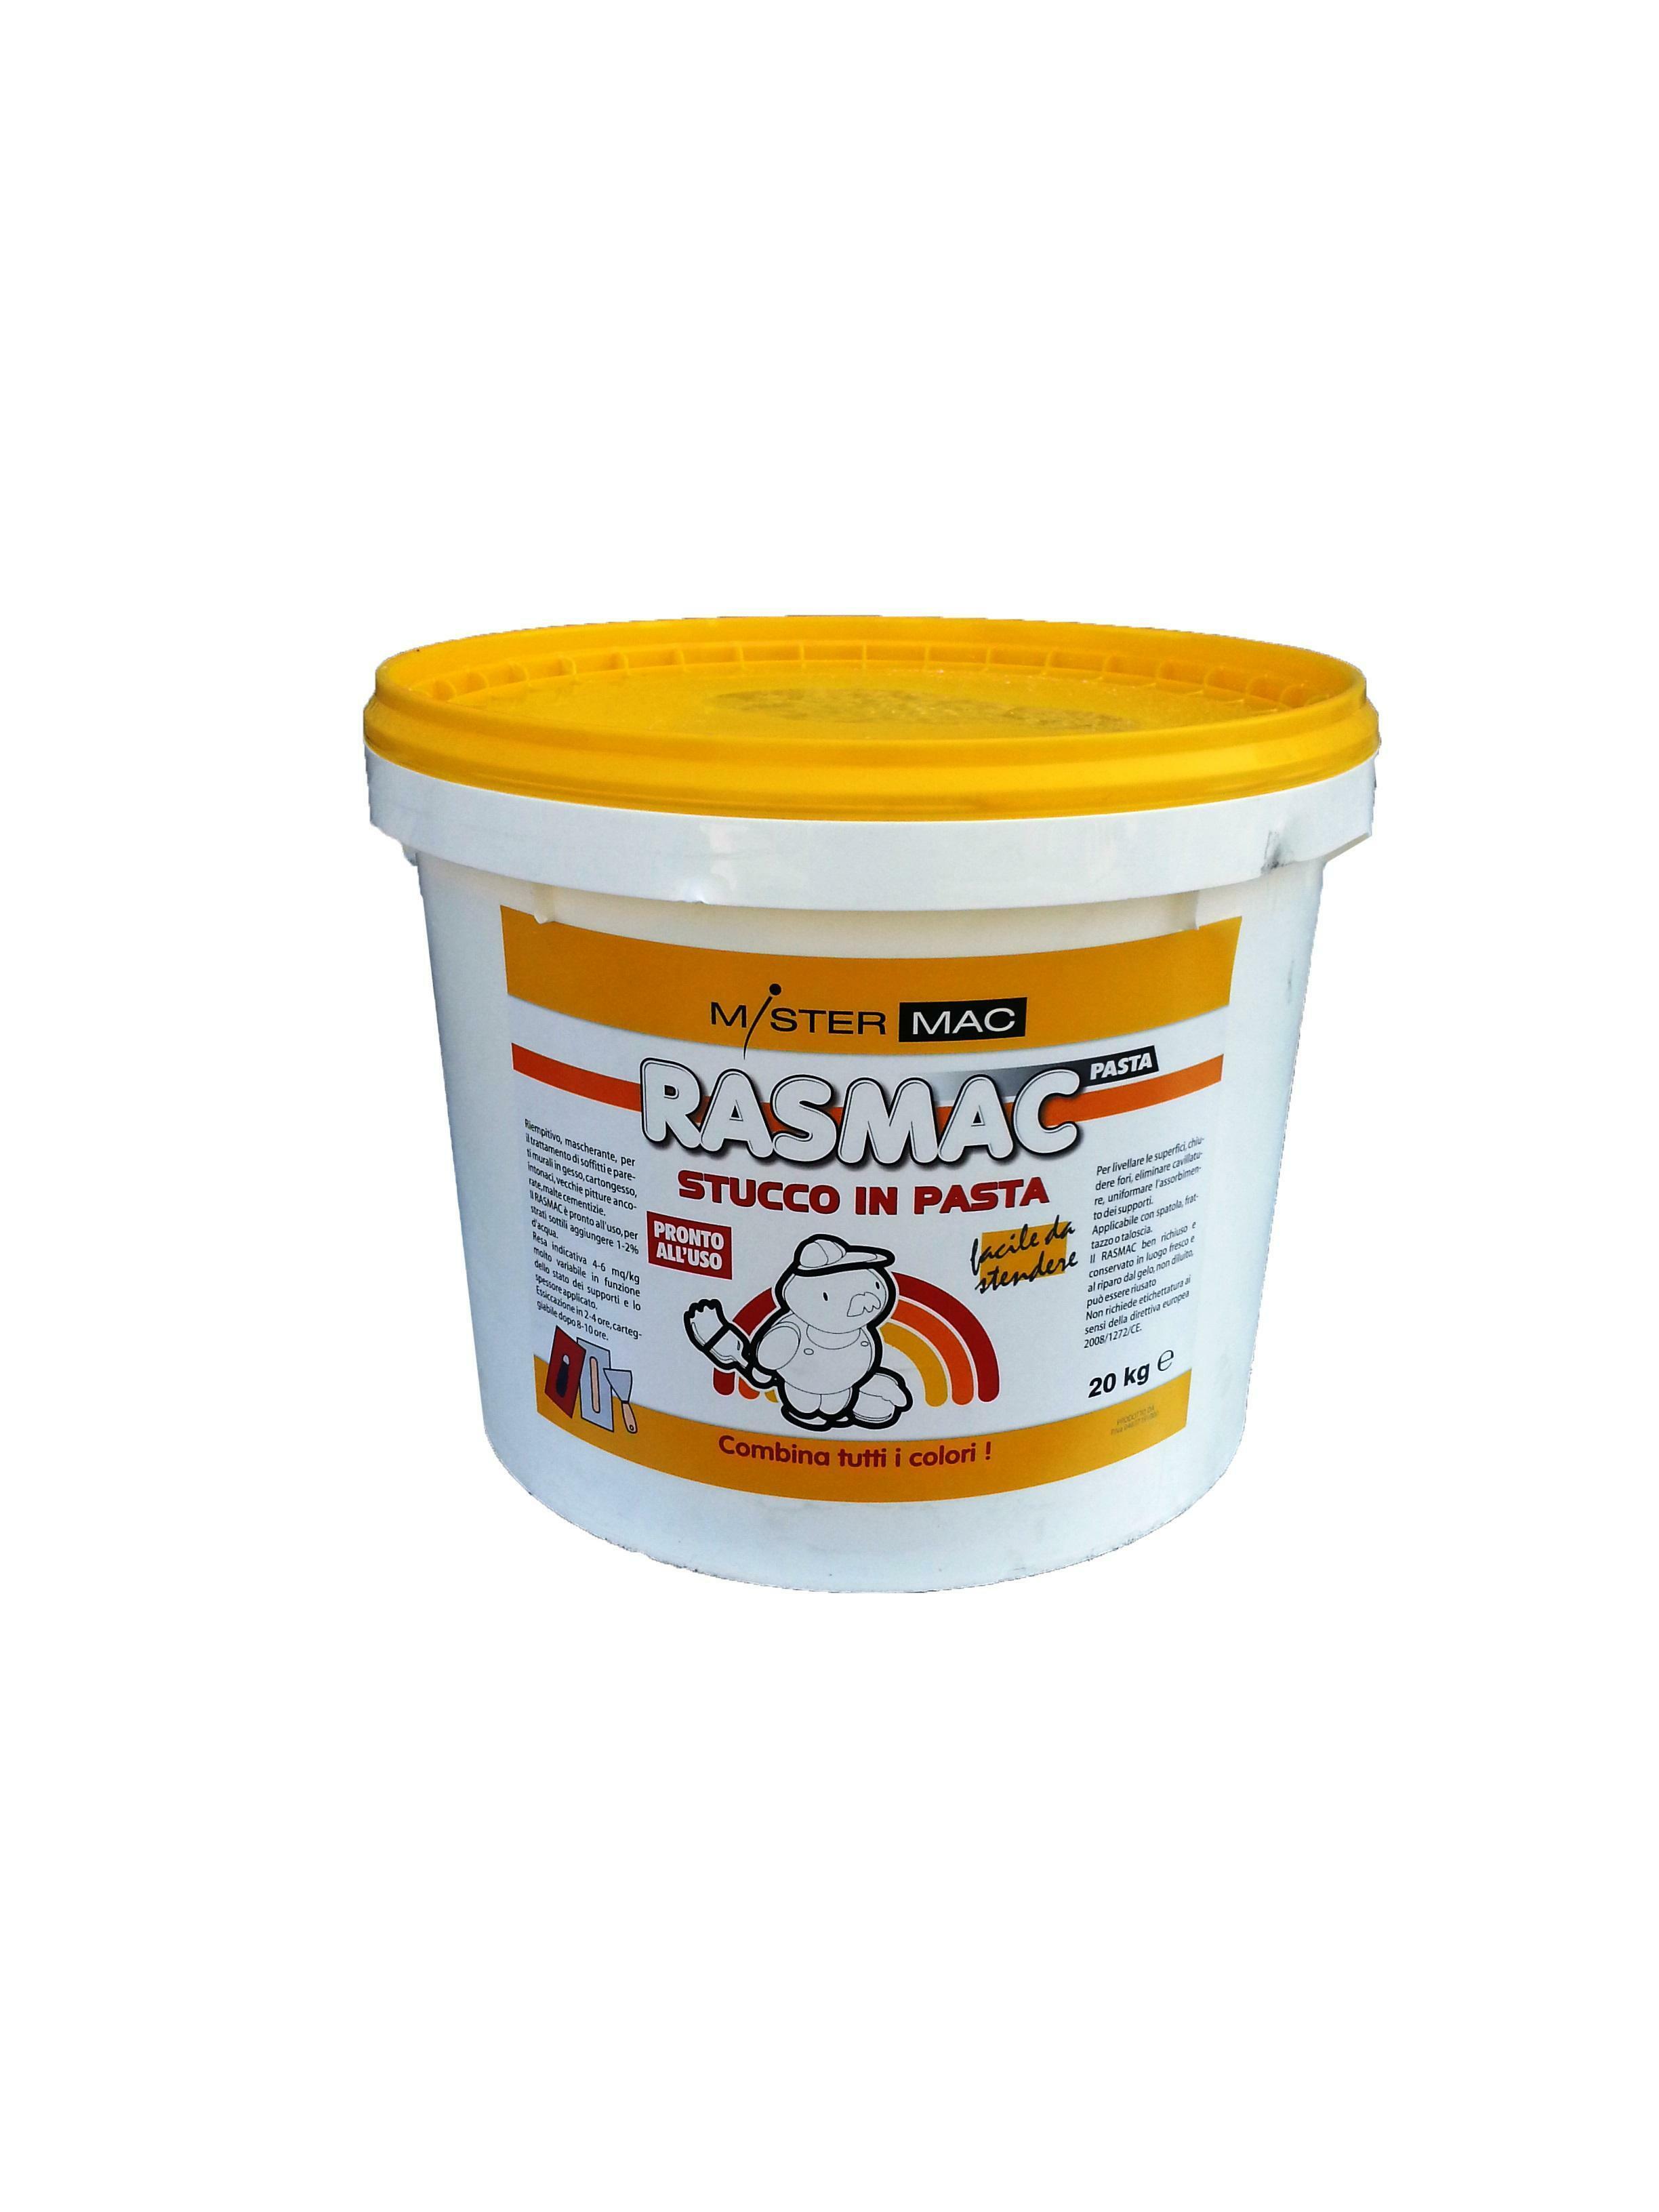 pro pro rasmac stucco in pasta plus bianchissimo 20 kg